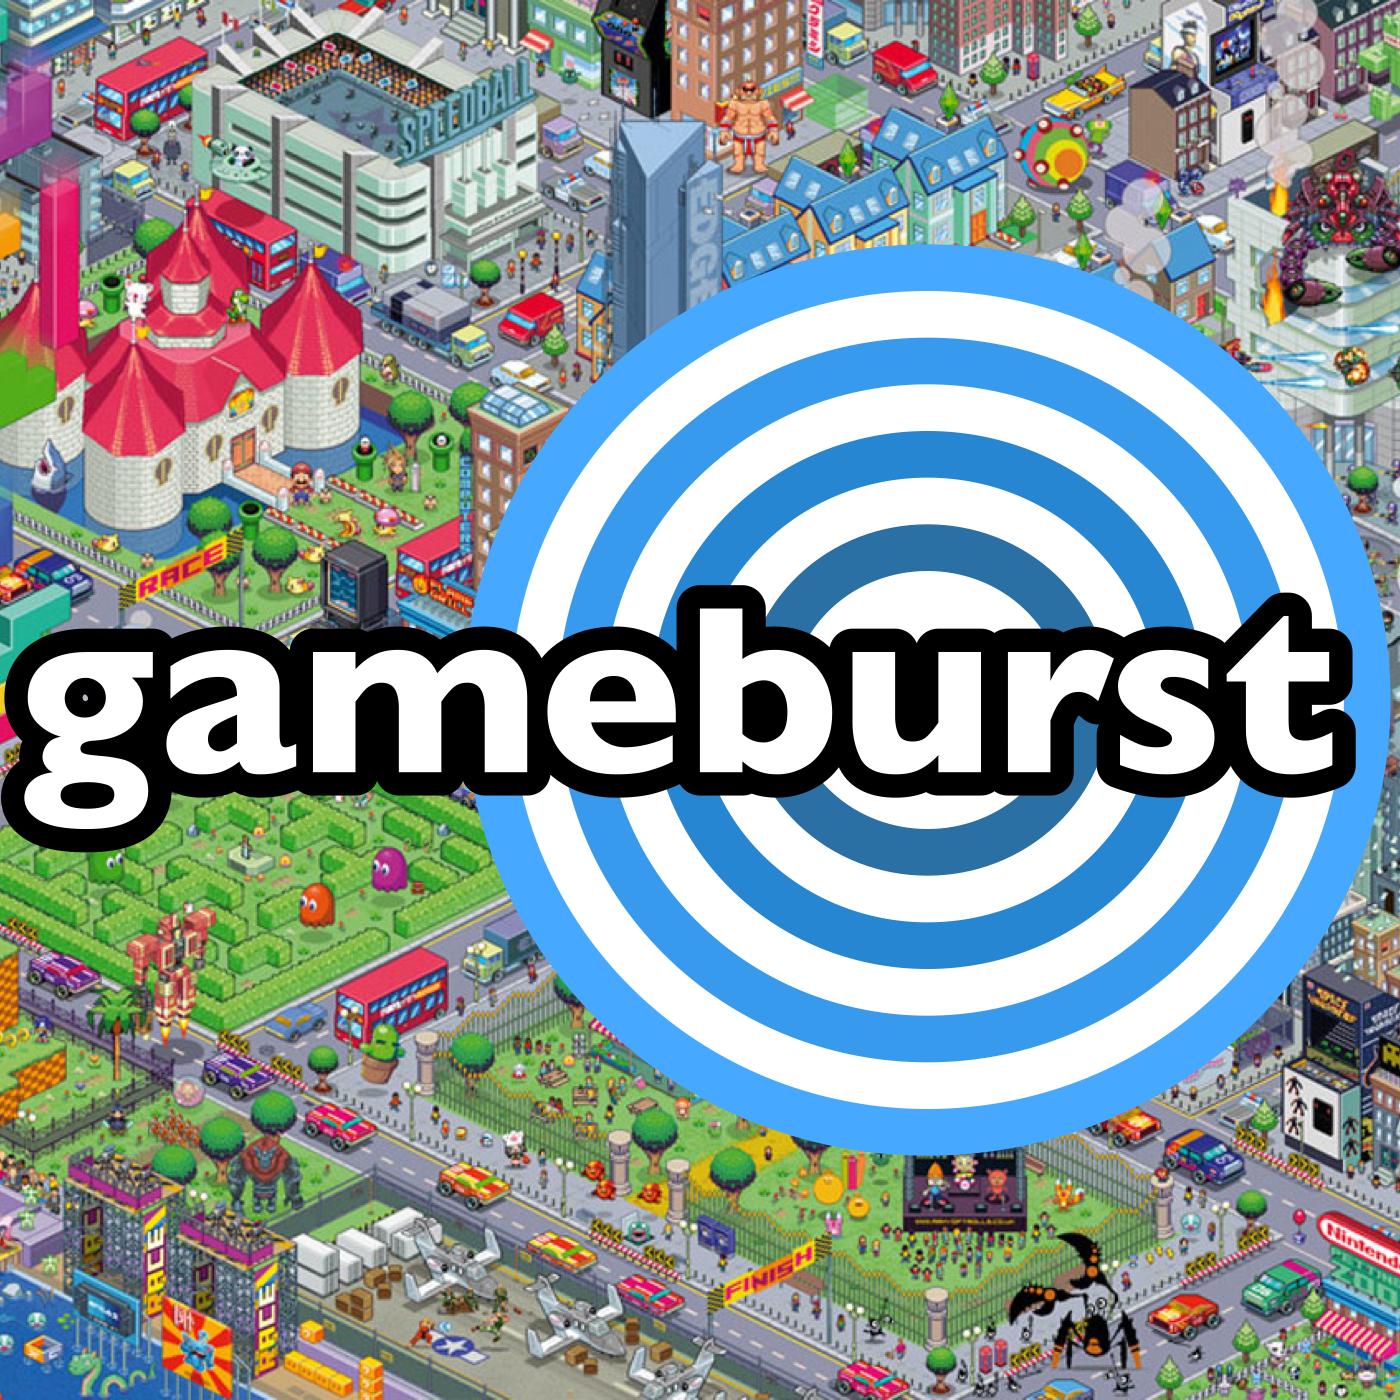 GameBurst   Podcast Addict